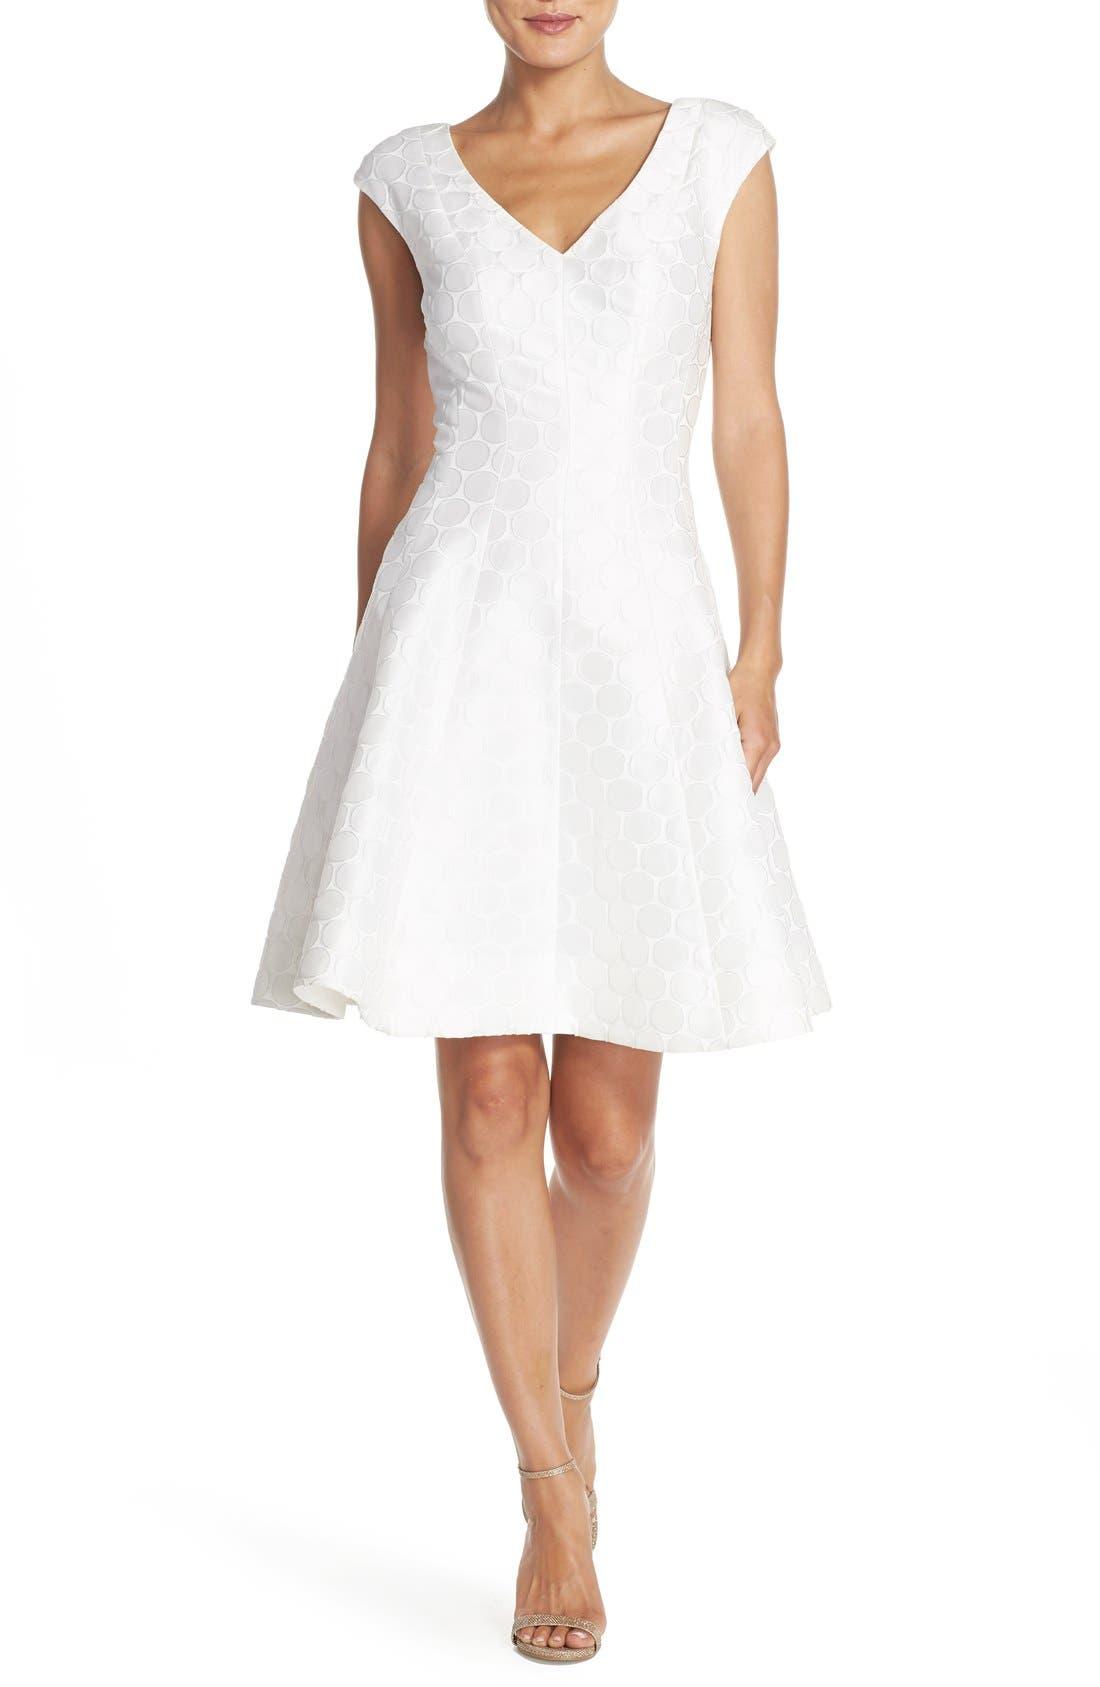 Alternate Image 1 Selected - Julia Jordan Jacquard Fit & Flare Dress